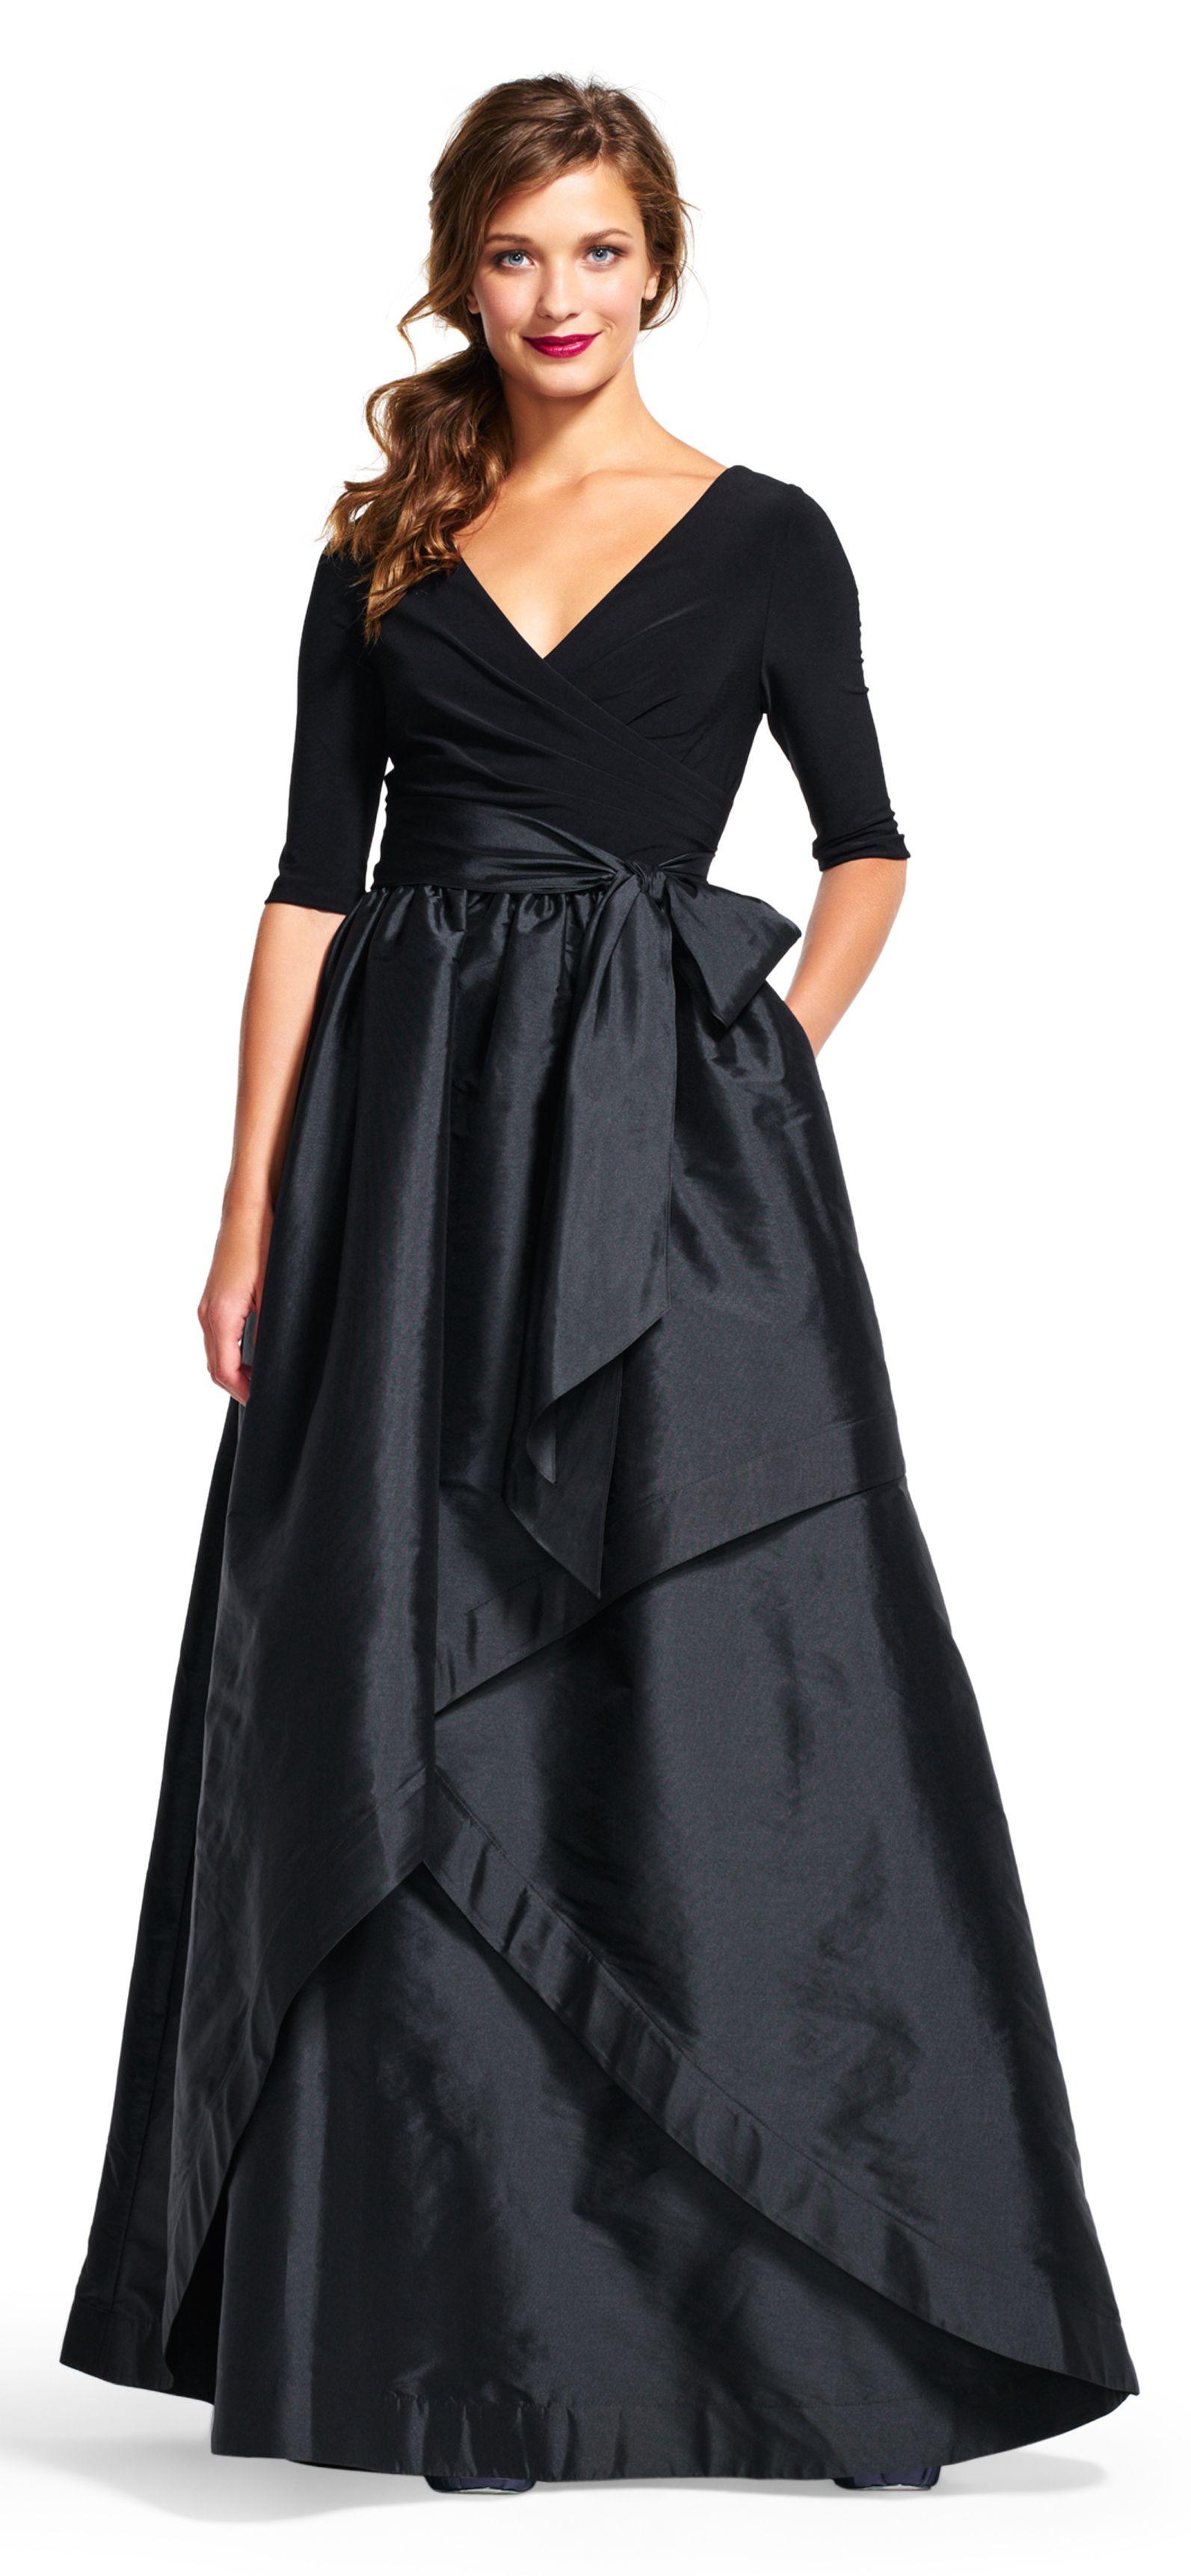 Black Taffeta Ball Gown Skirts